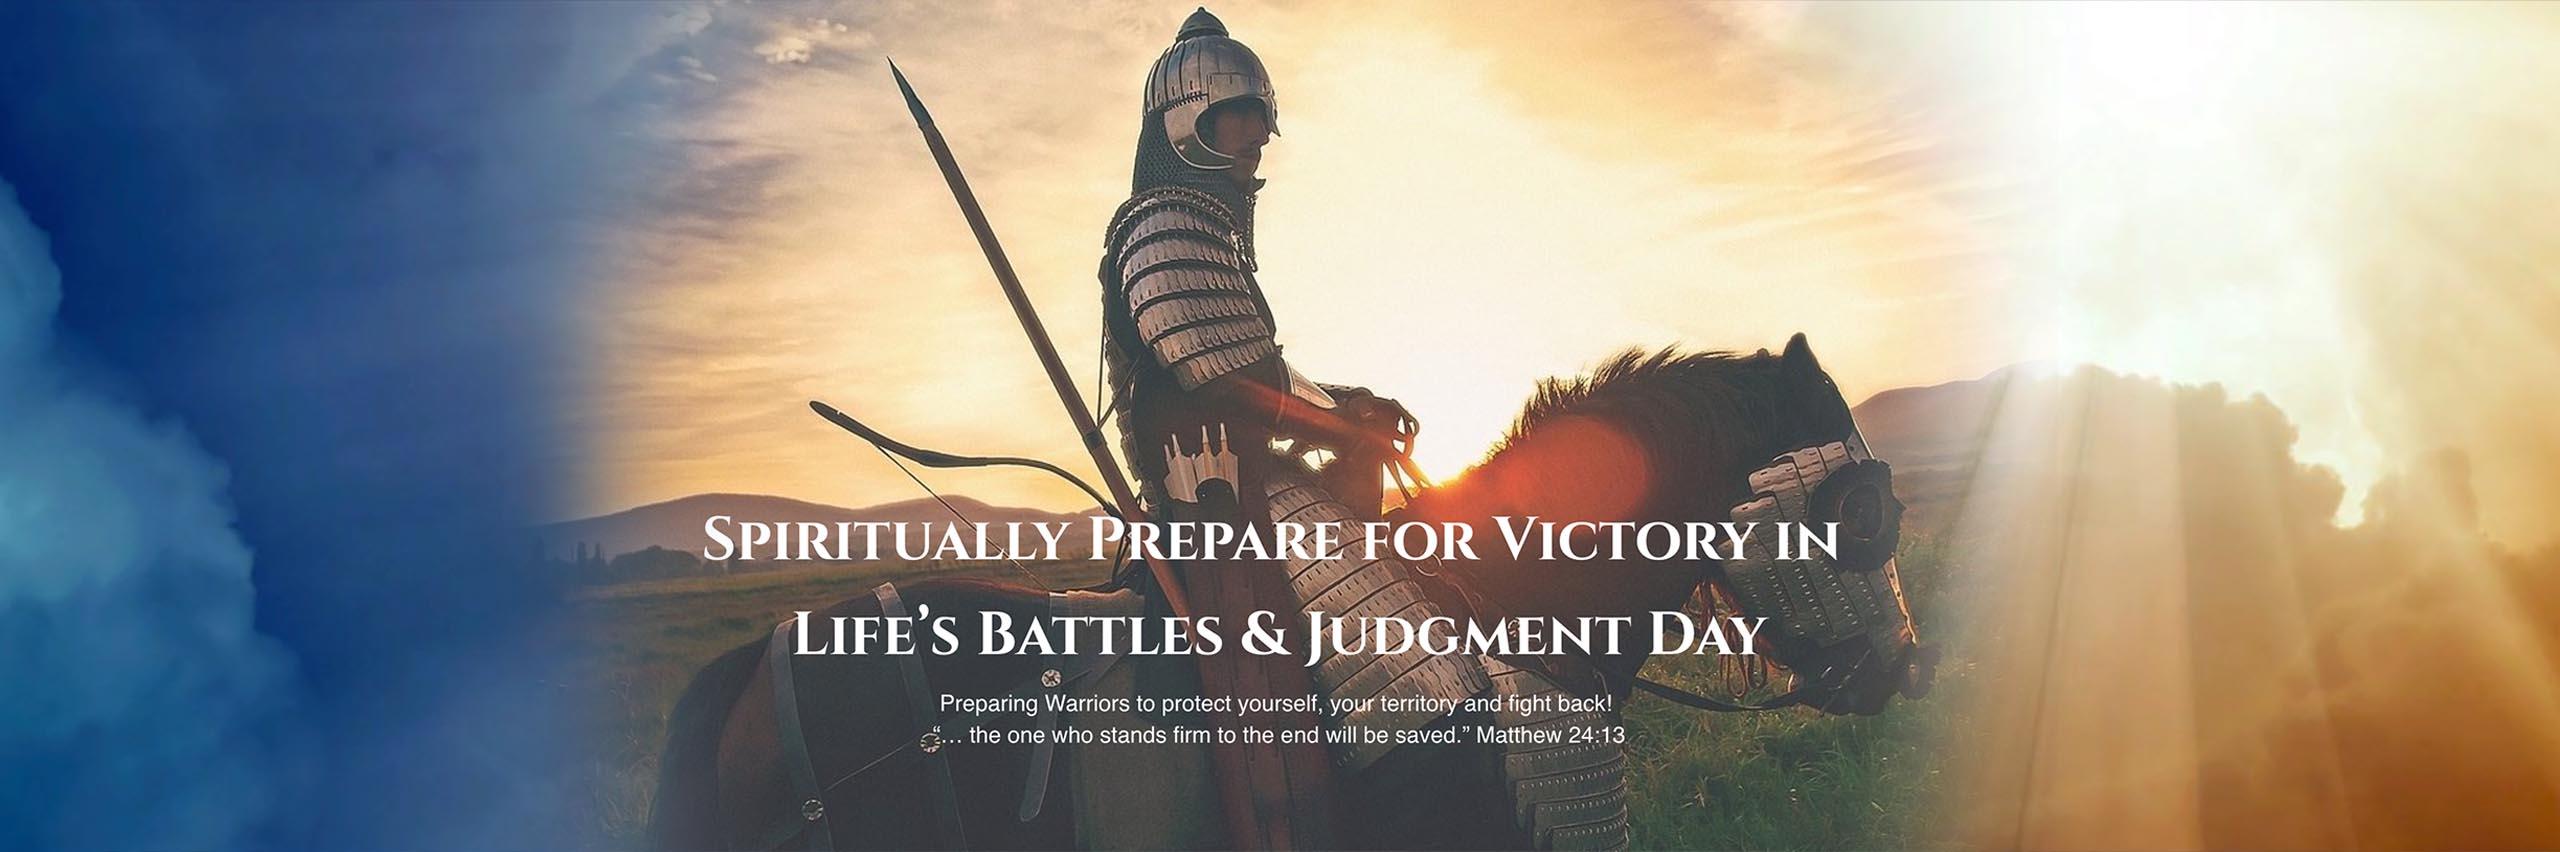 PreparedWarriors_header2